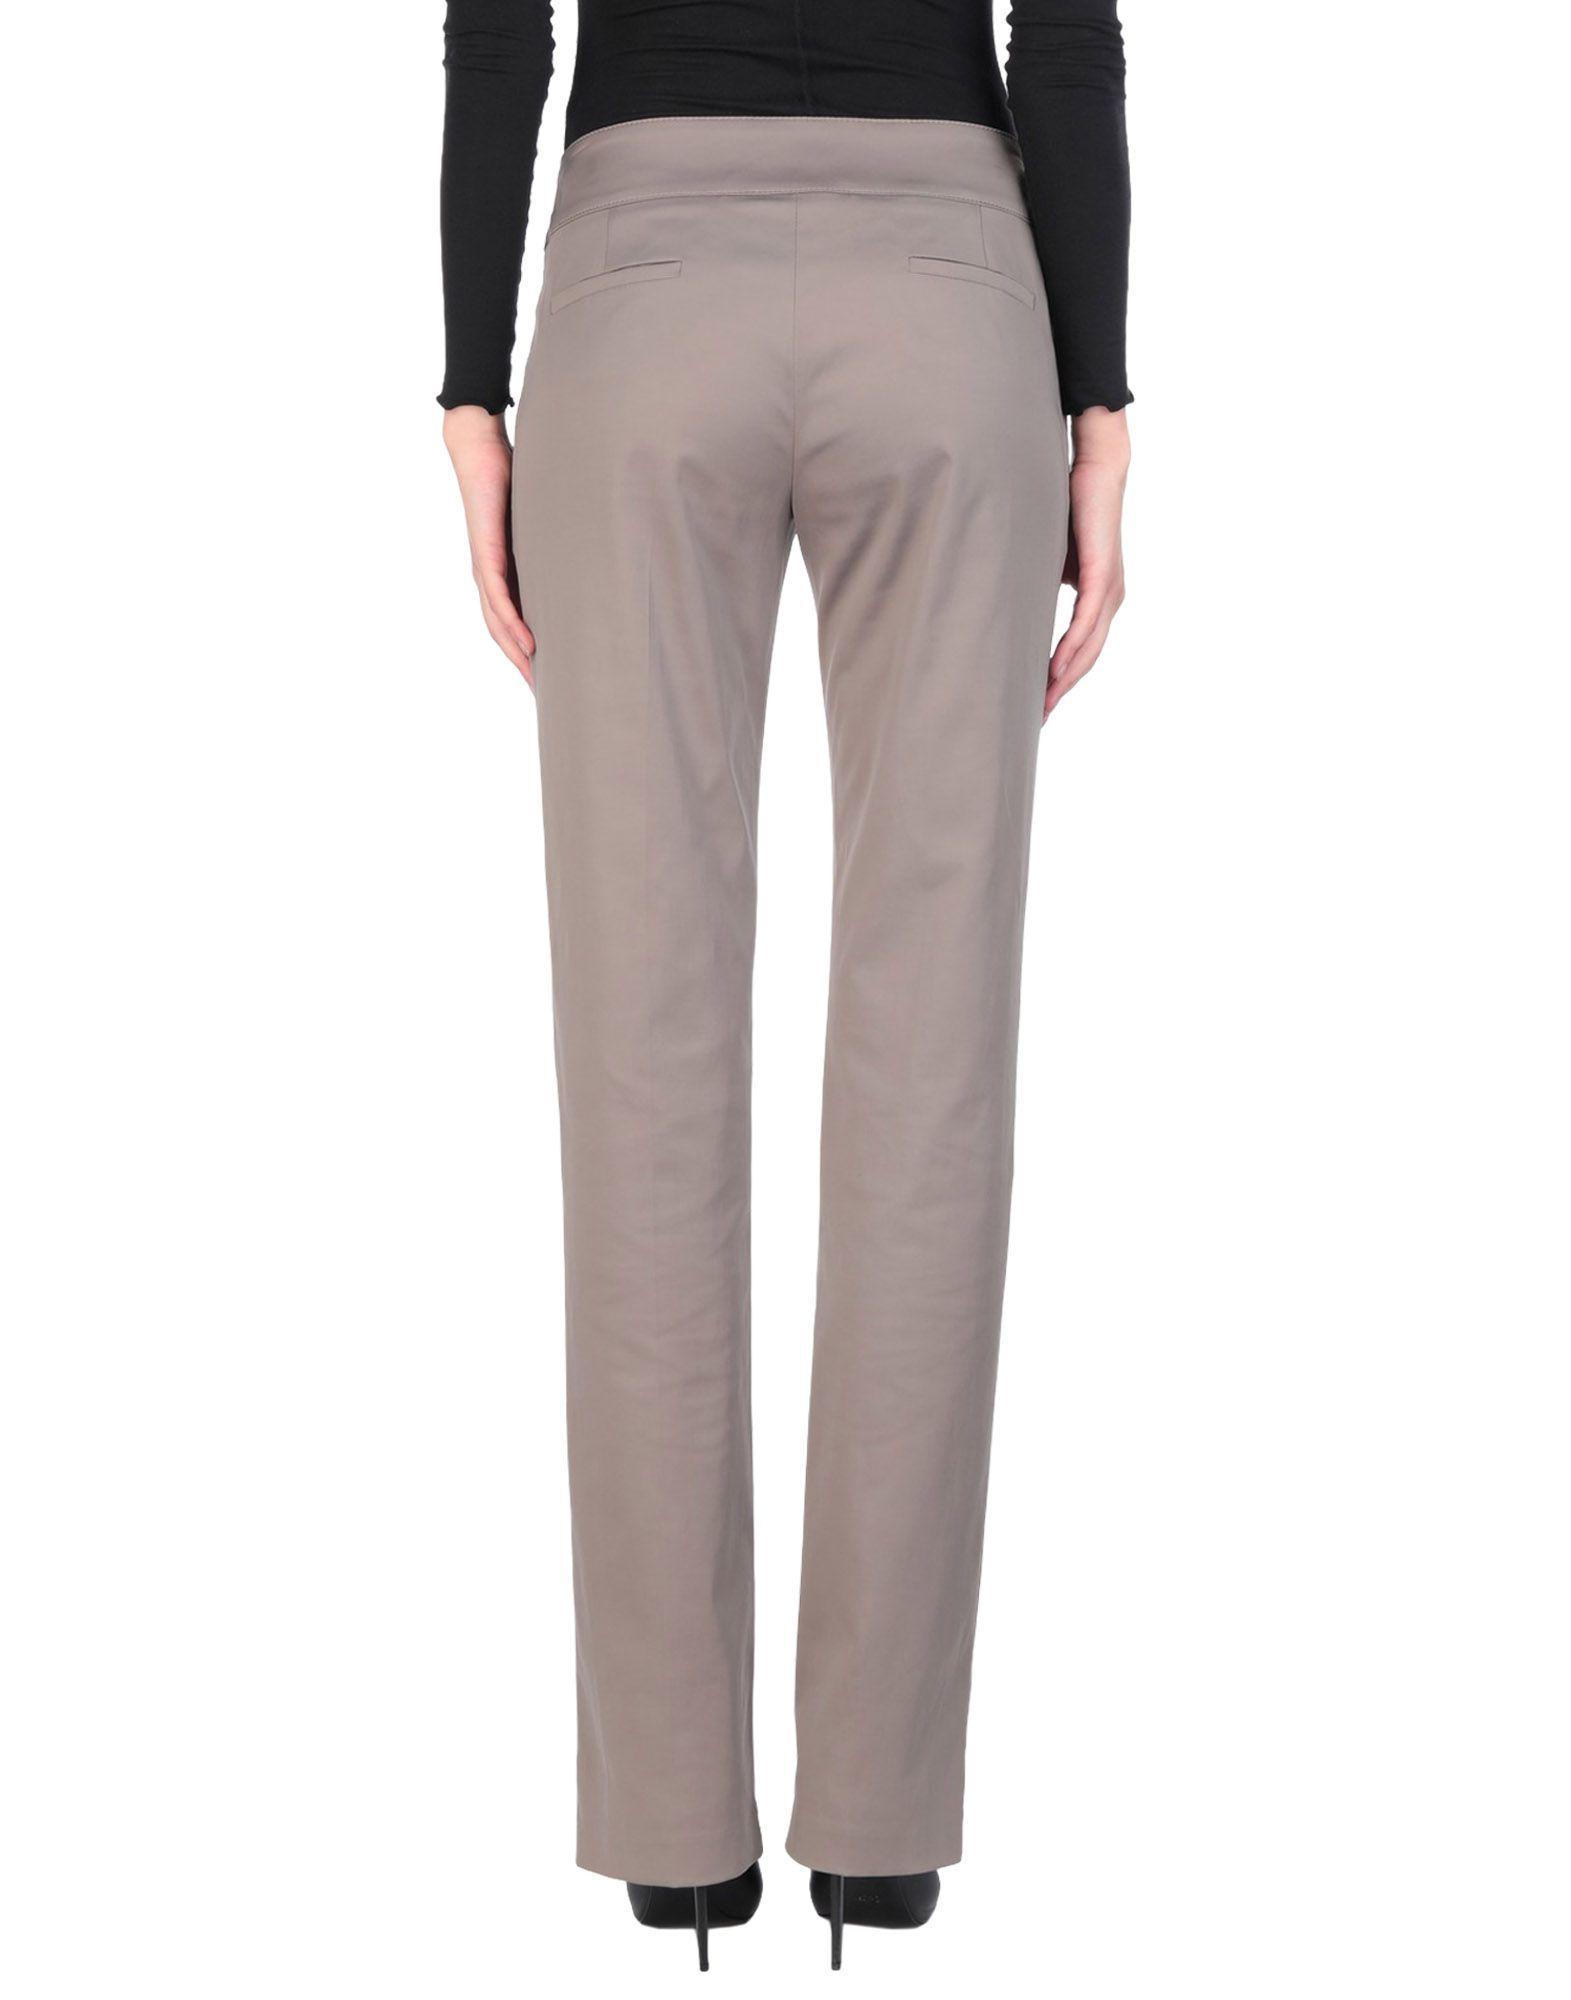 Elisabetta Franchi Grey Trousers